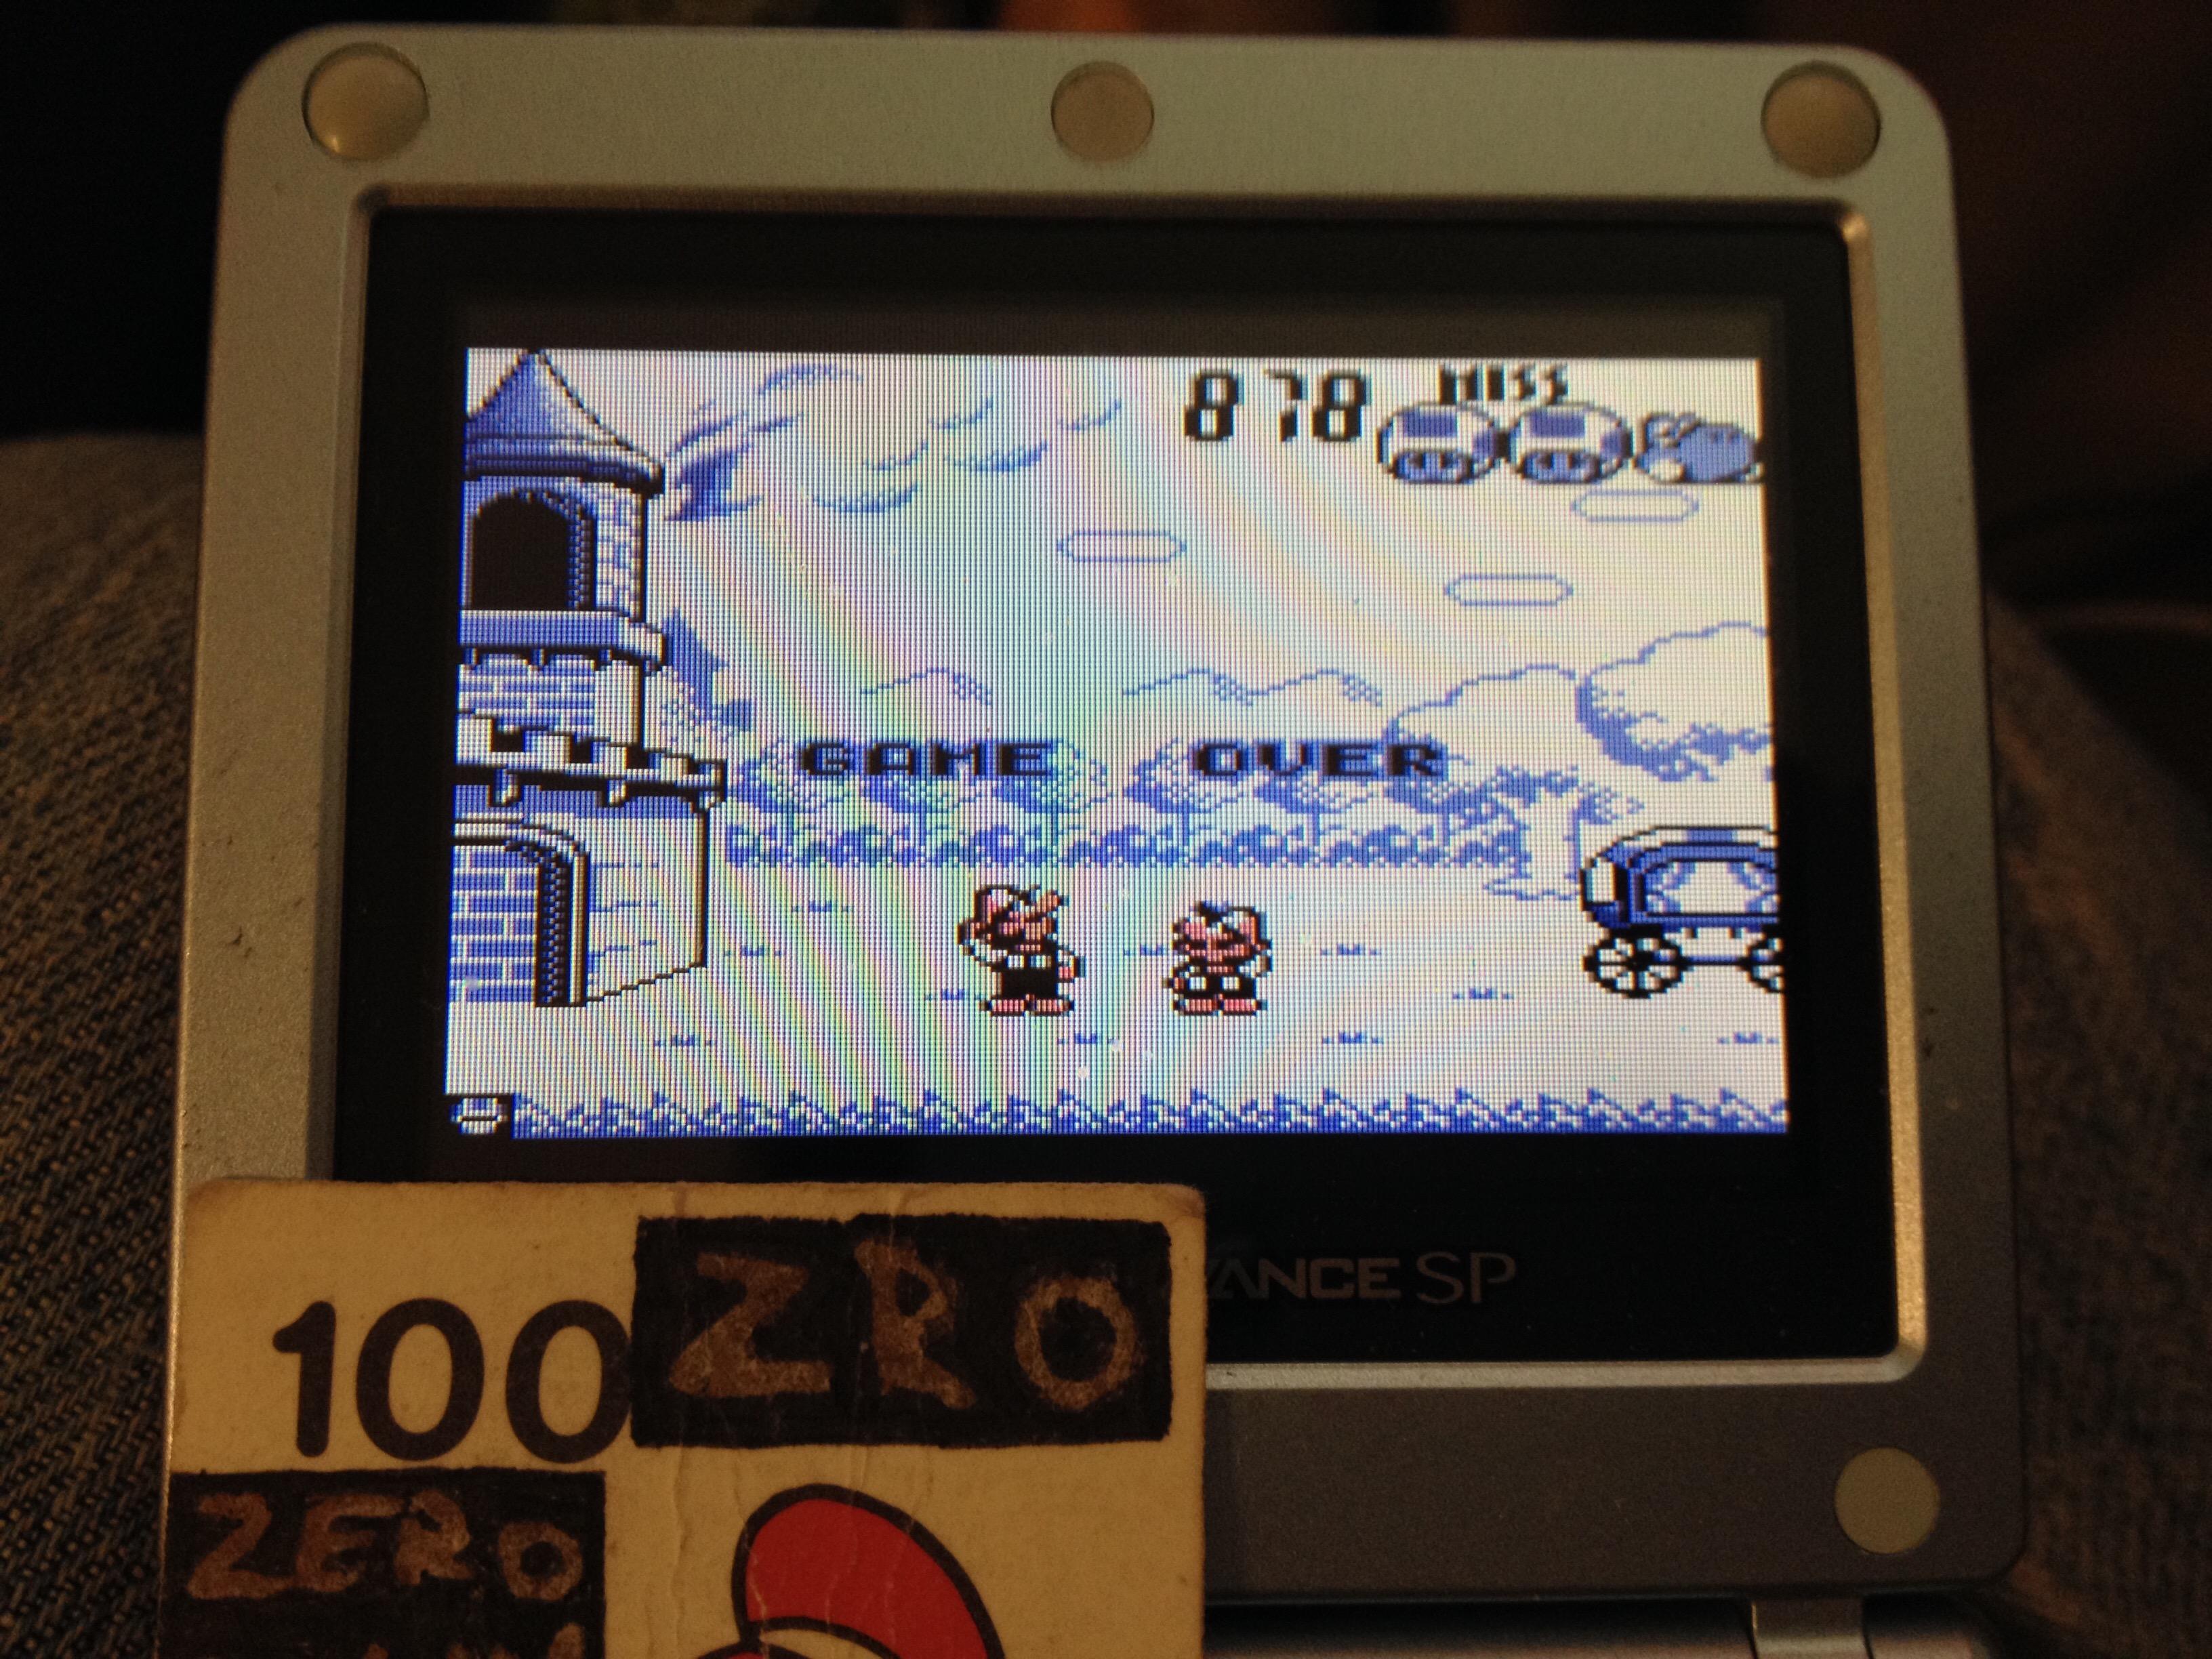 zerooskul: Game & Watch Gallery: Fire [Modern: Easy] (Game Boy) 878 points on 2019-05-29 12:37:58